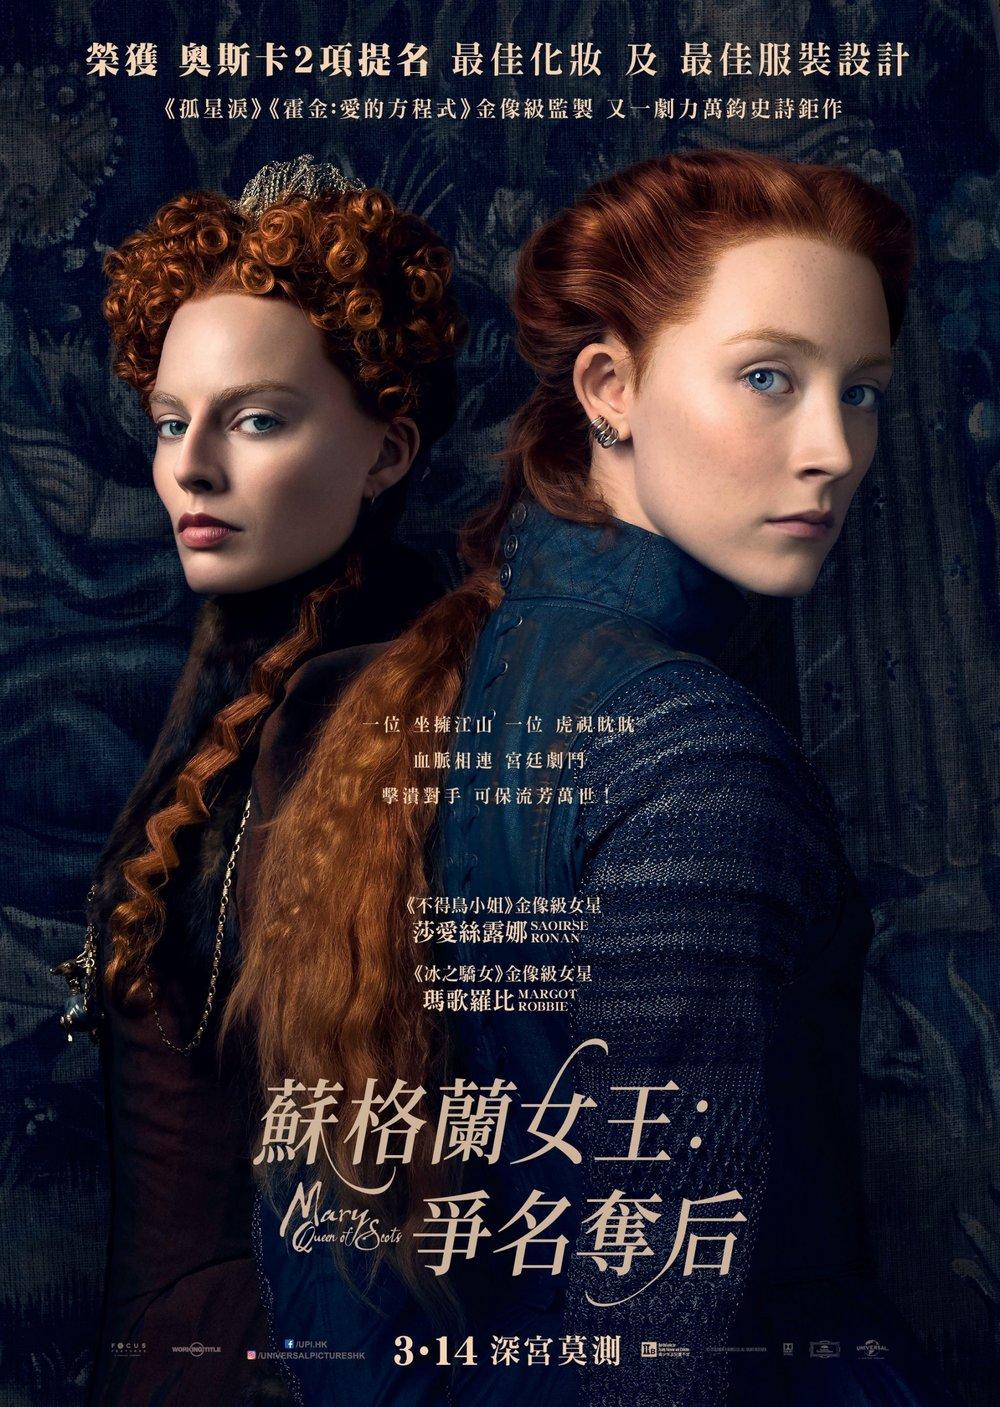 20190214_MaryQueenofScots_Poster.jpg